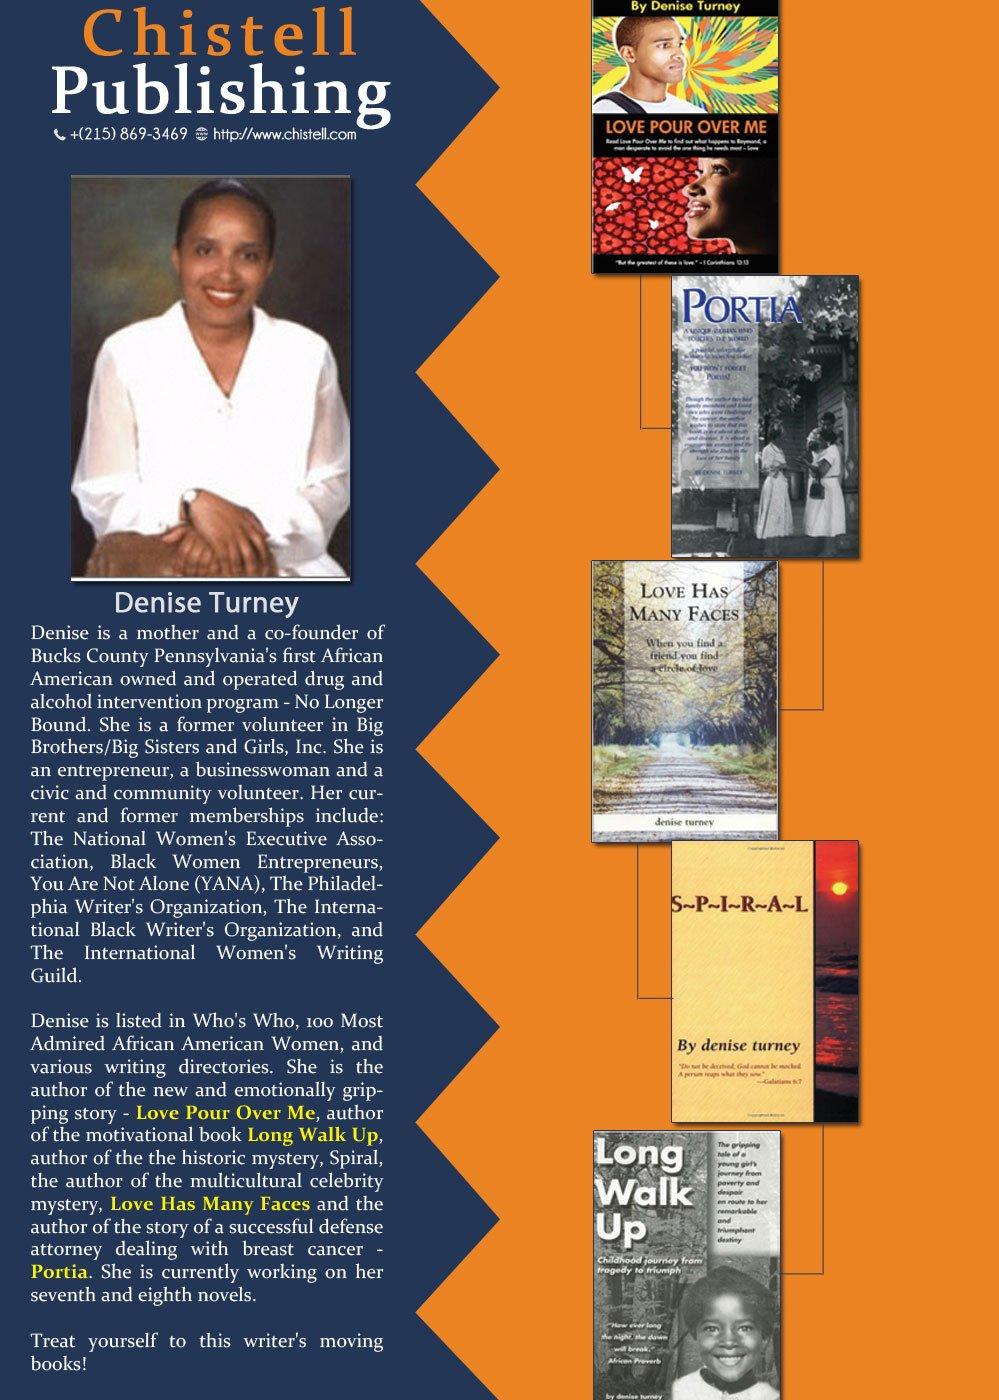 Denise Turney Book 6.8.19